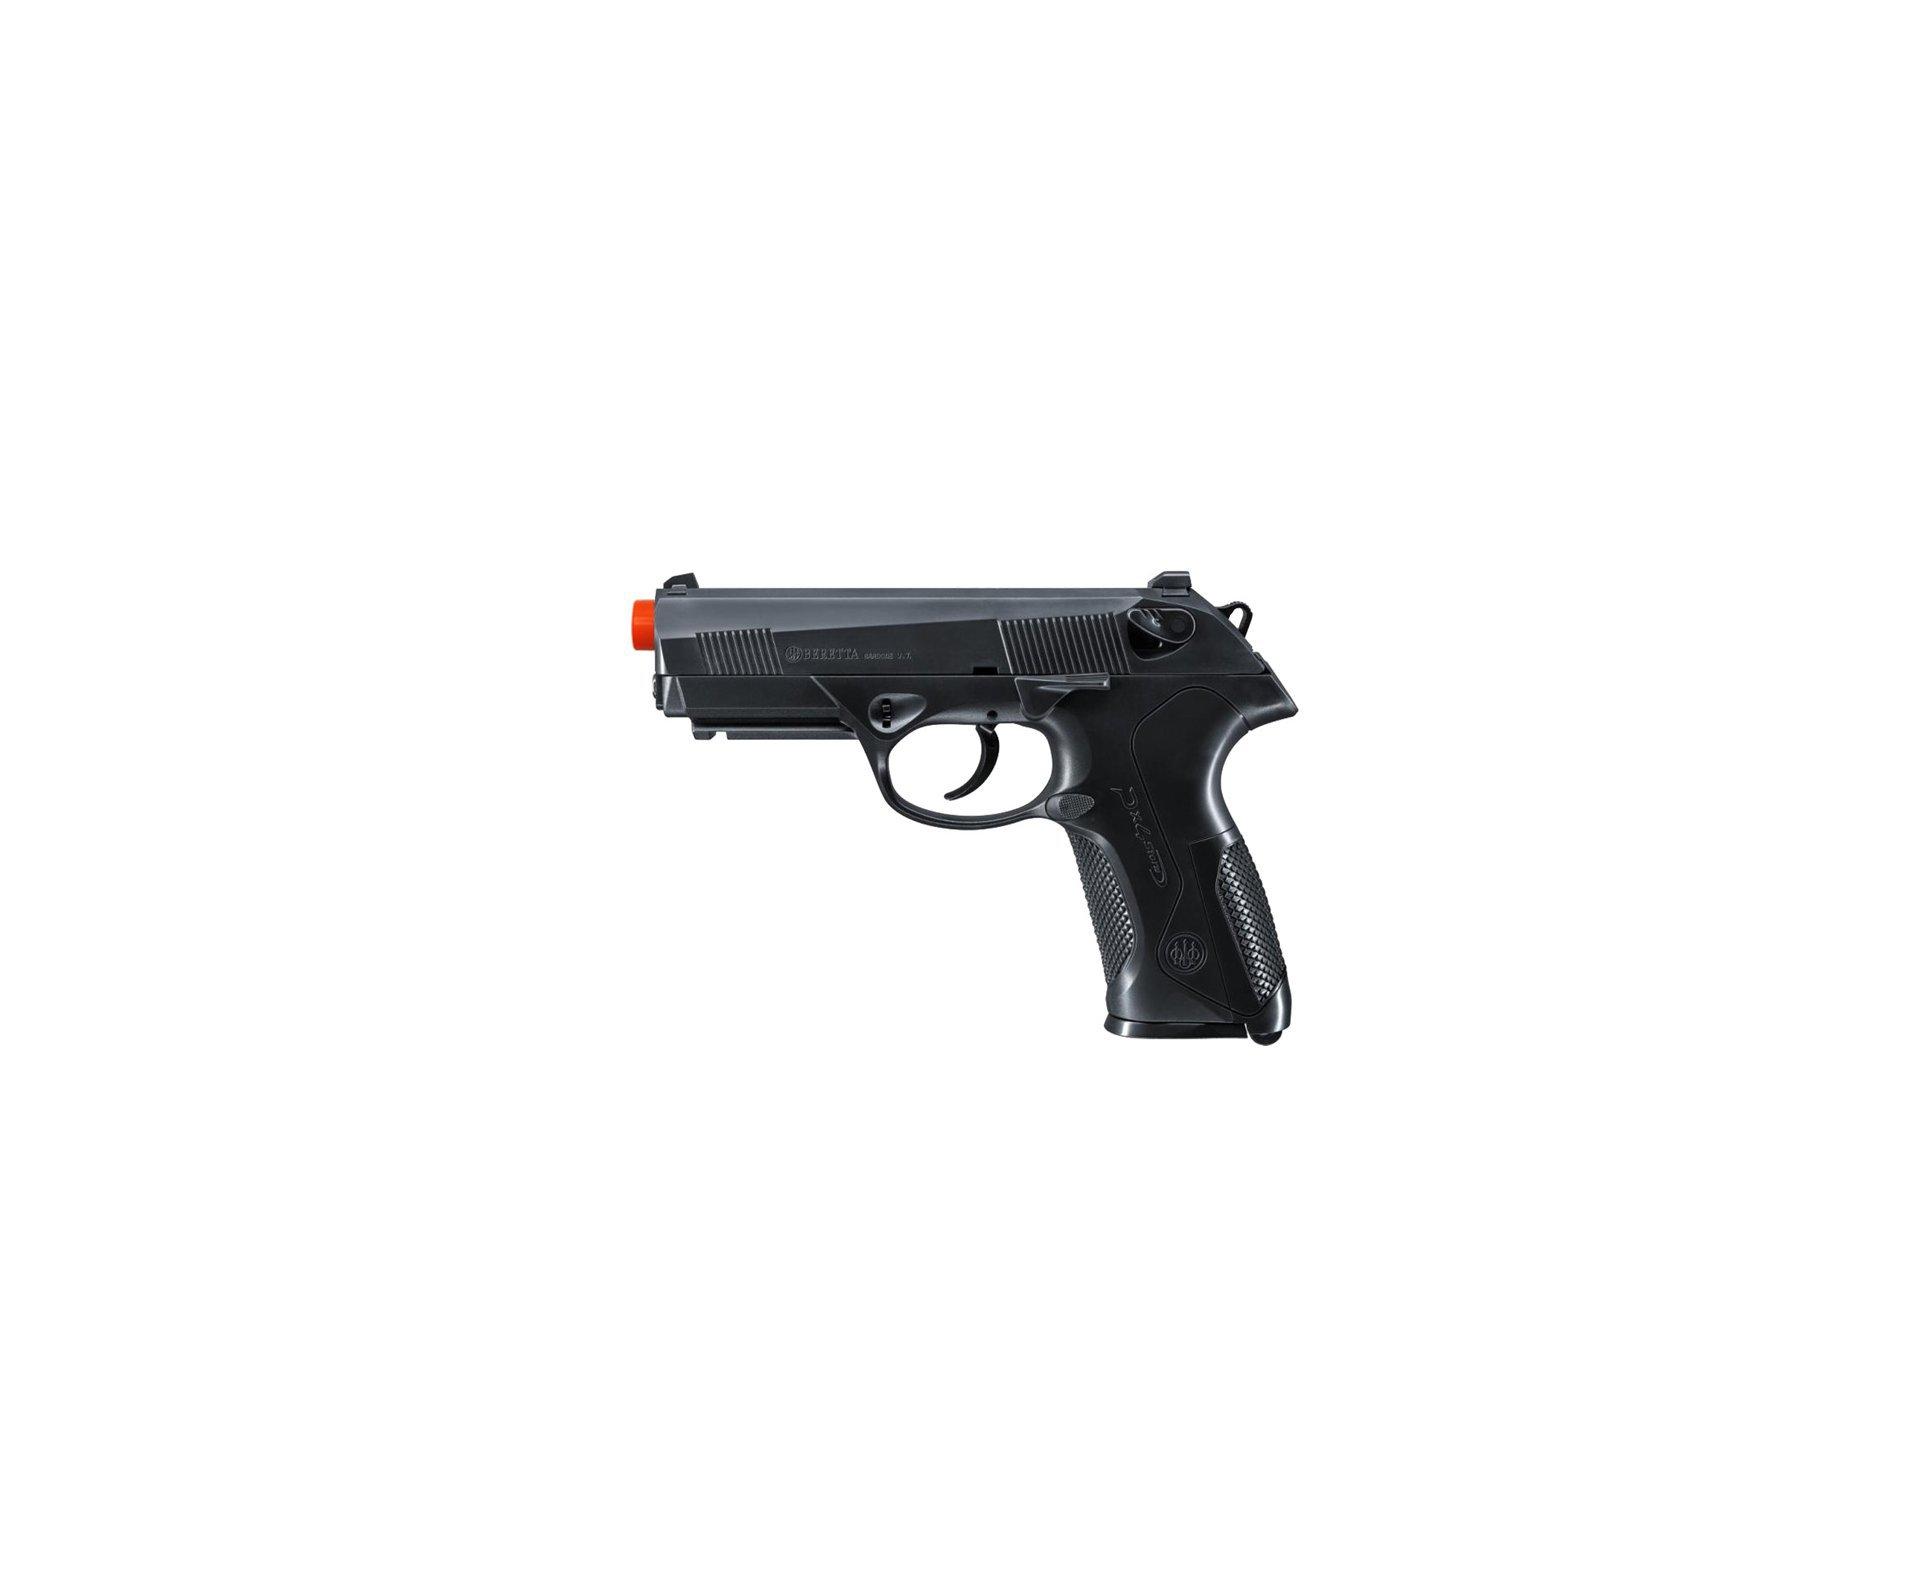 Pistola De Airsoft Beretta Px4 Storm Abs Cal 6,0 Mm + 4000 Esferas 0,12g + Case Deluxe - Umarex